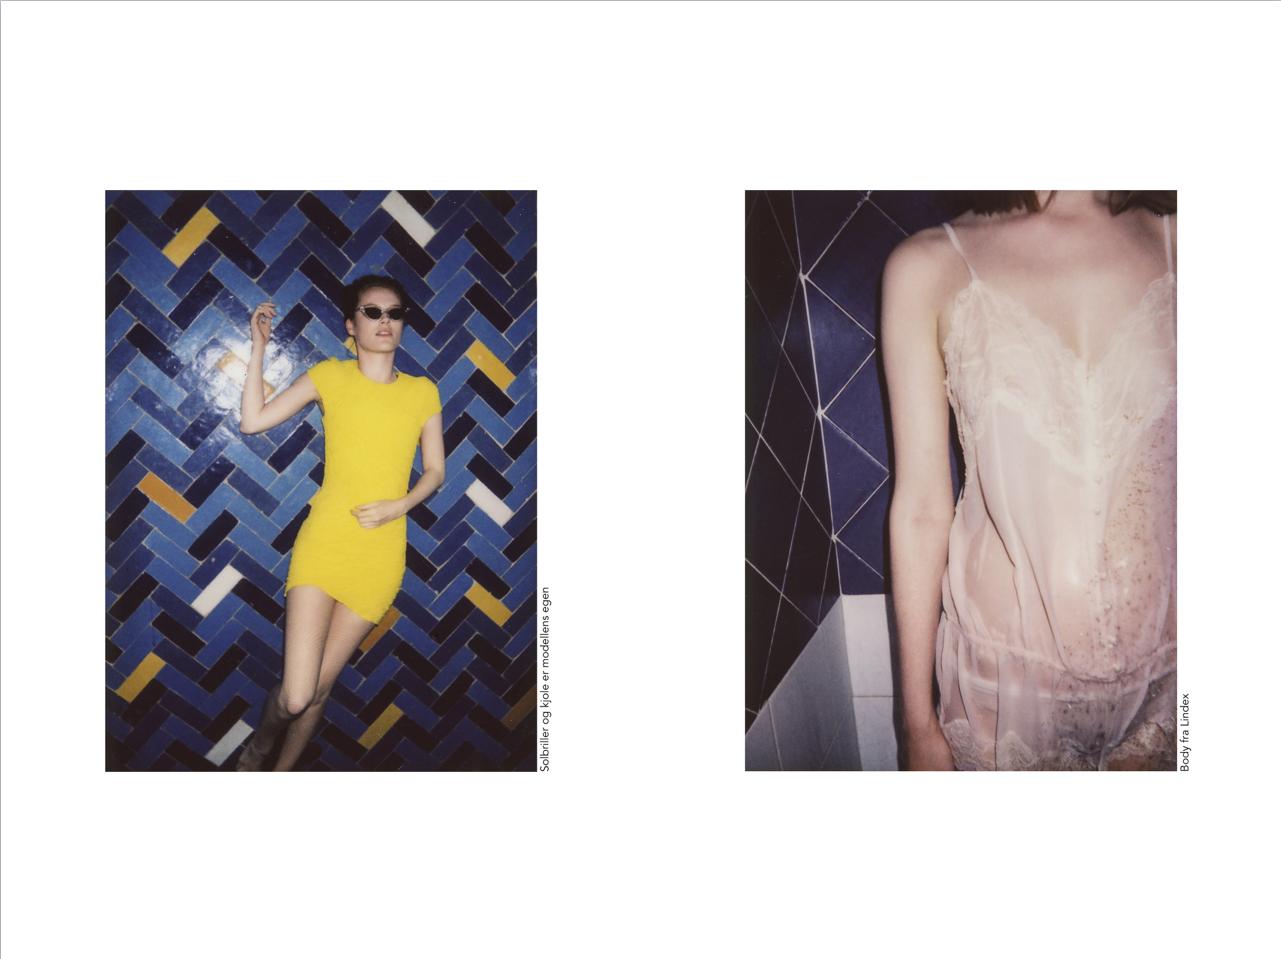 Foto: Ane Borch. Modell: Karla, Trend Models